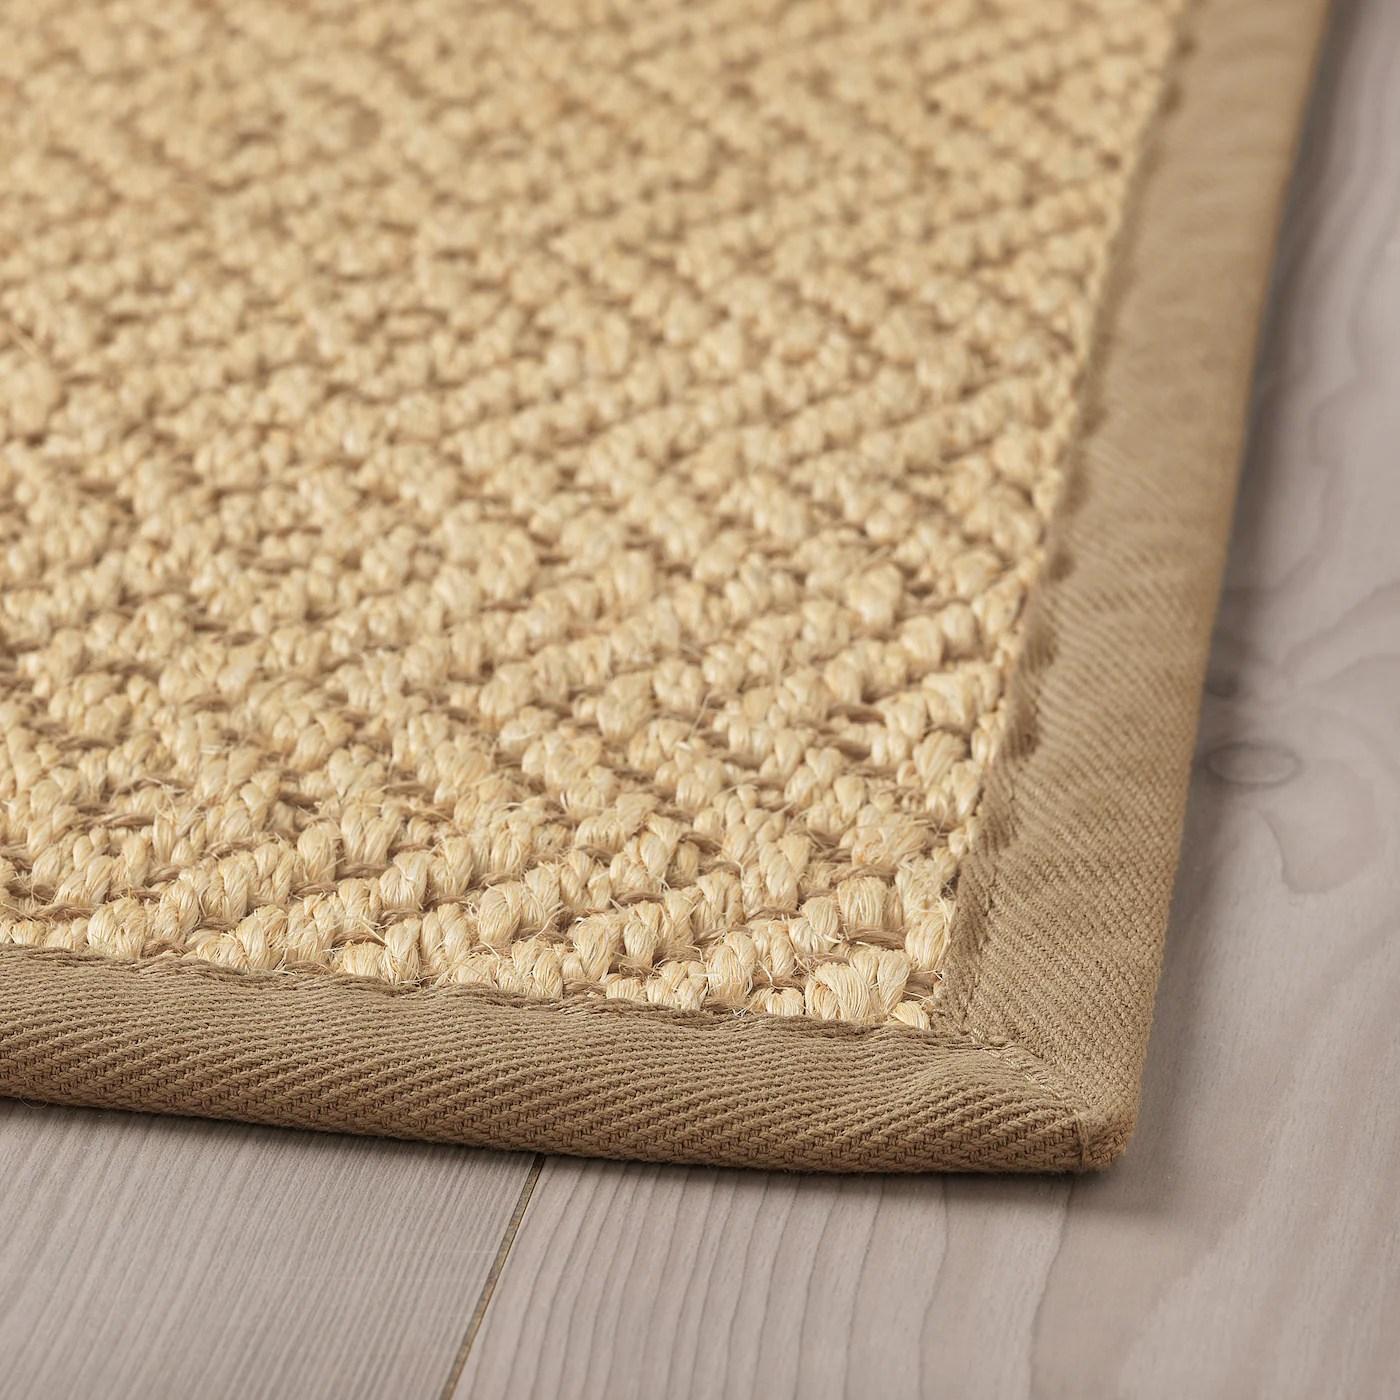 vistoft tapis tisse a plat naturel 200x300 cm